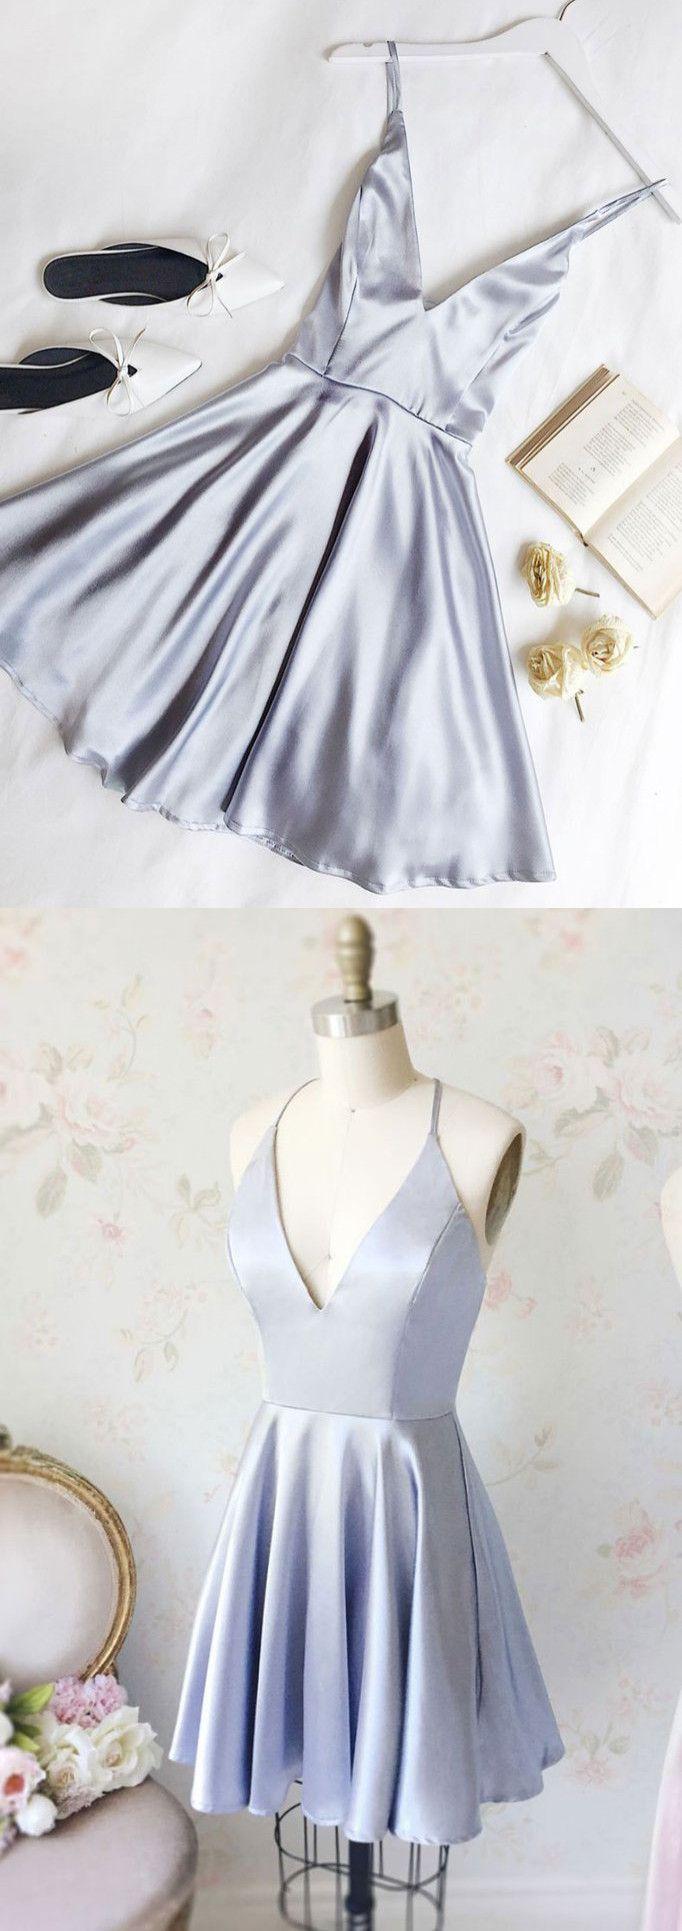 chic aline v neck homecoming dresses short prom dress simple